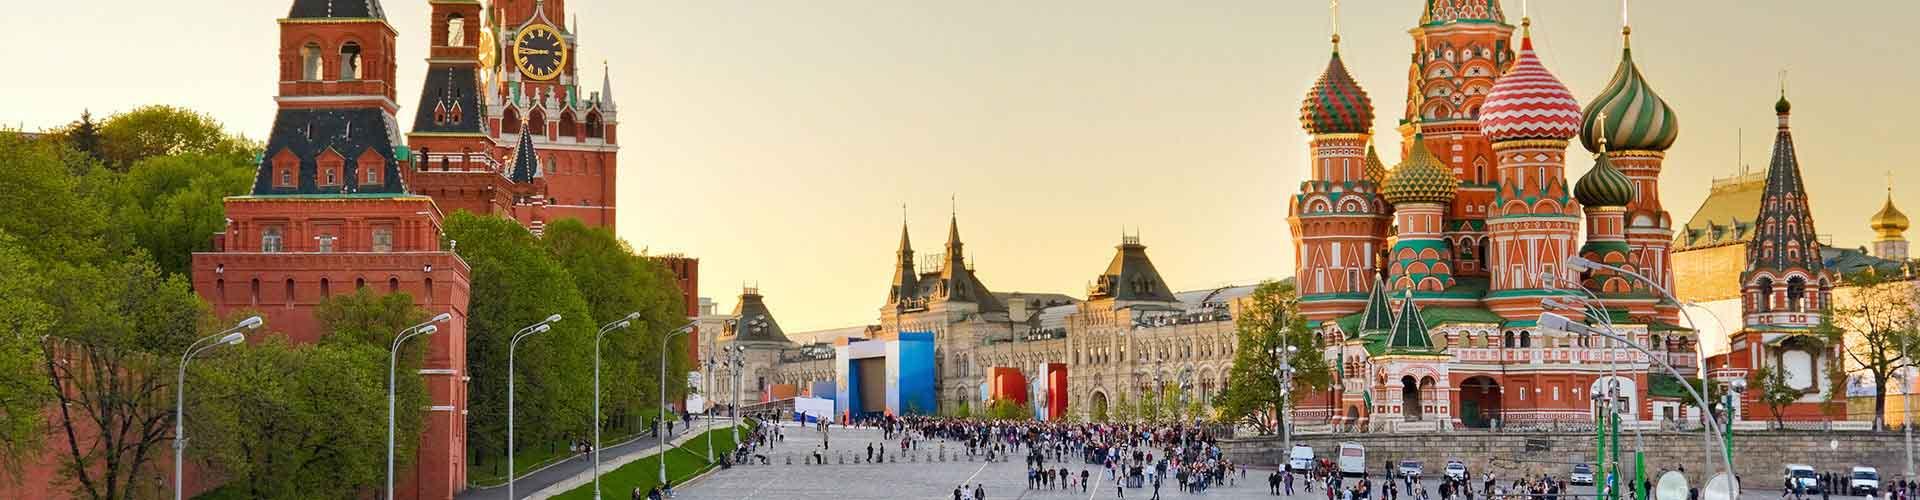 Mosca – Ostelli in Mosca. Mappe per Mosca, Foto e  Recensioni per ogni Ostello a Mosca.